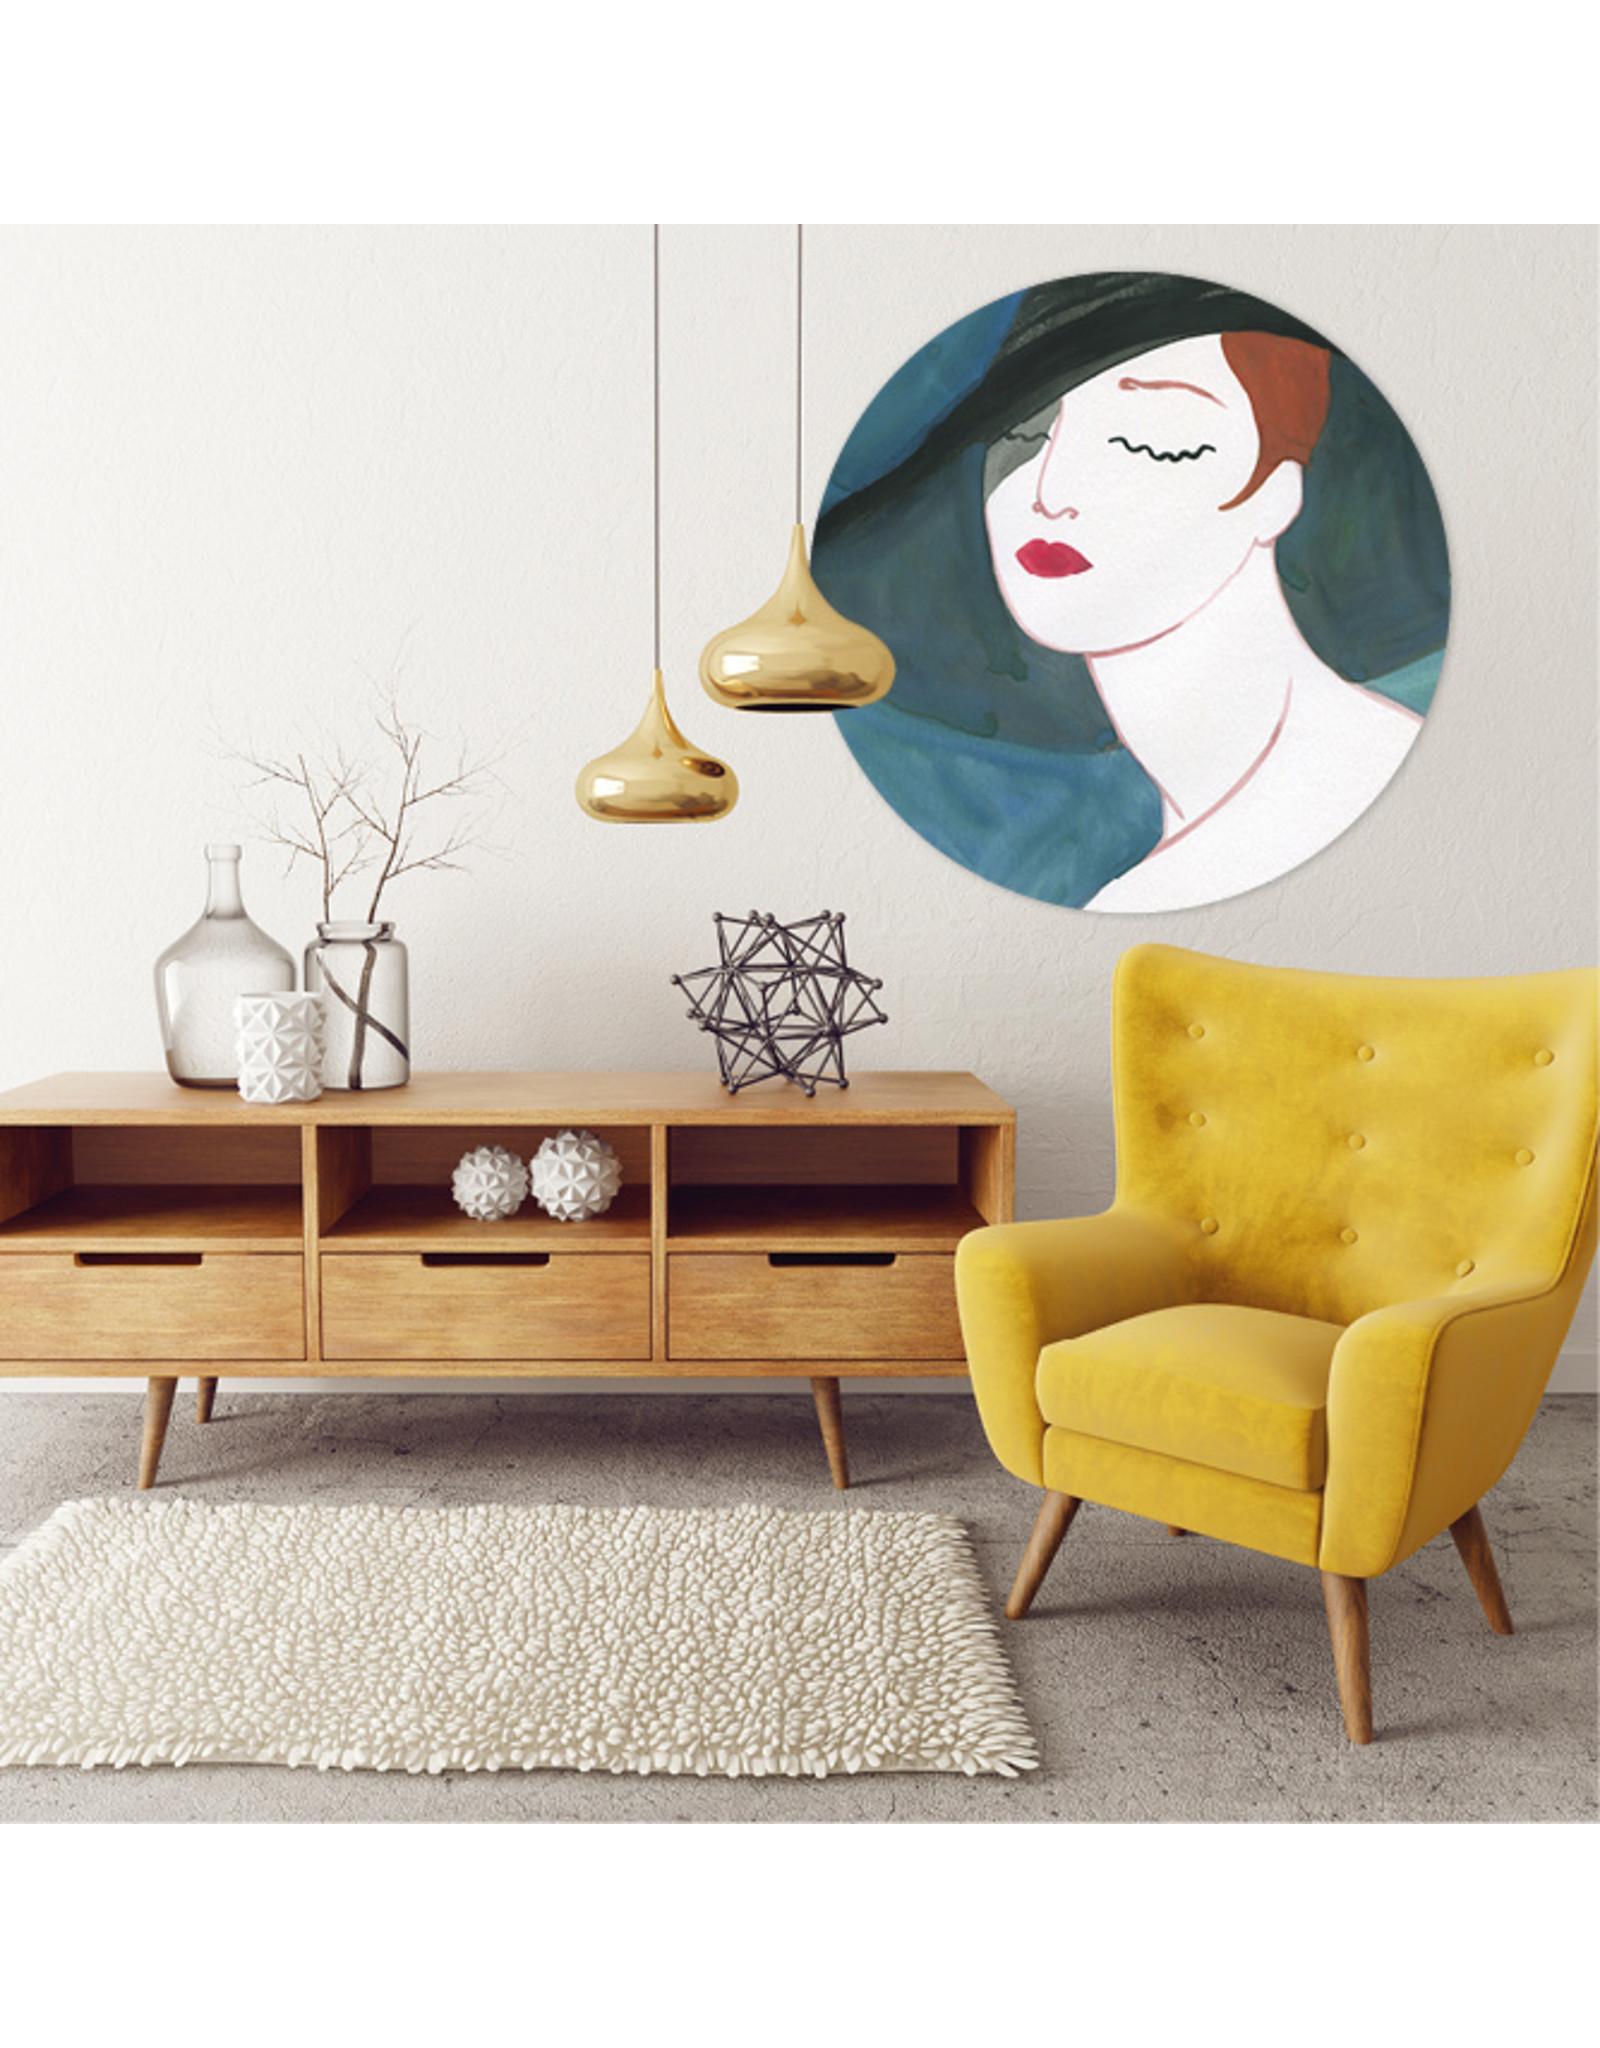 Dunnebier Home Muursticker Woman_painting_No2 - verwijderbaar